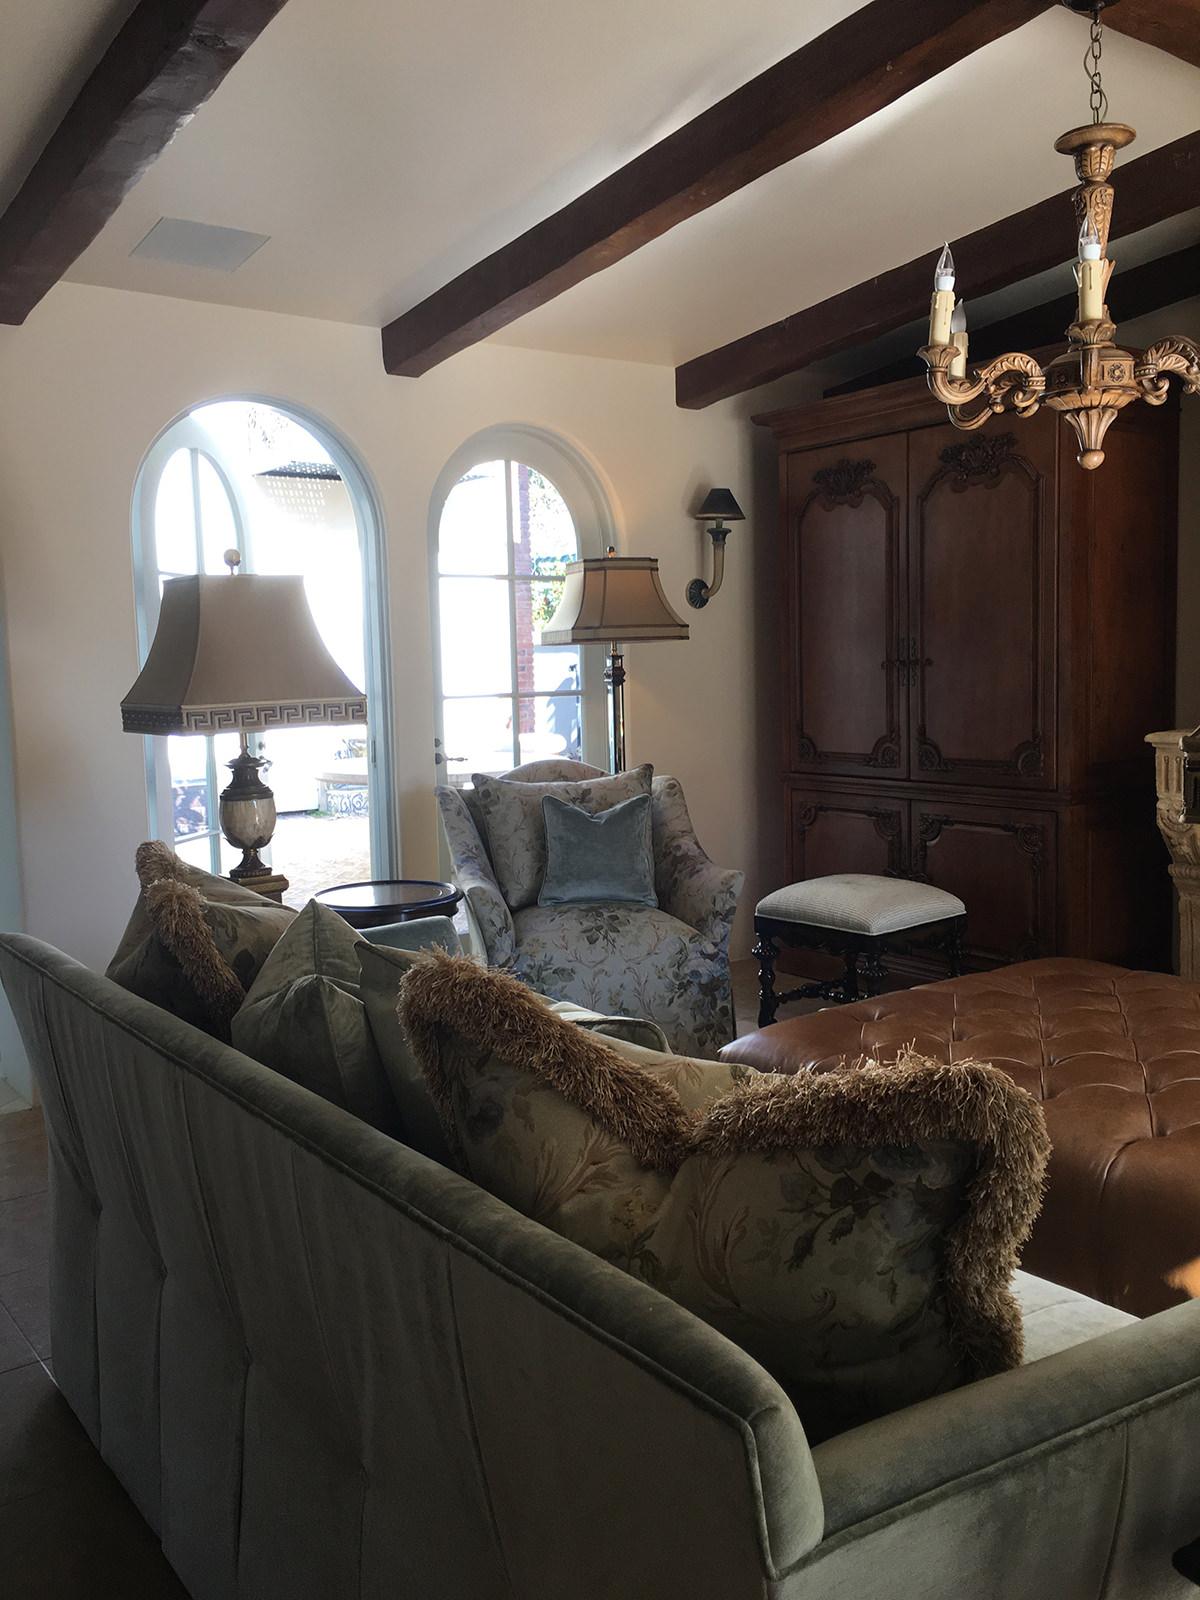 palo-alto-california-french-chateau-family-room-interior-design-montgomery-home-2.jpg